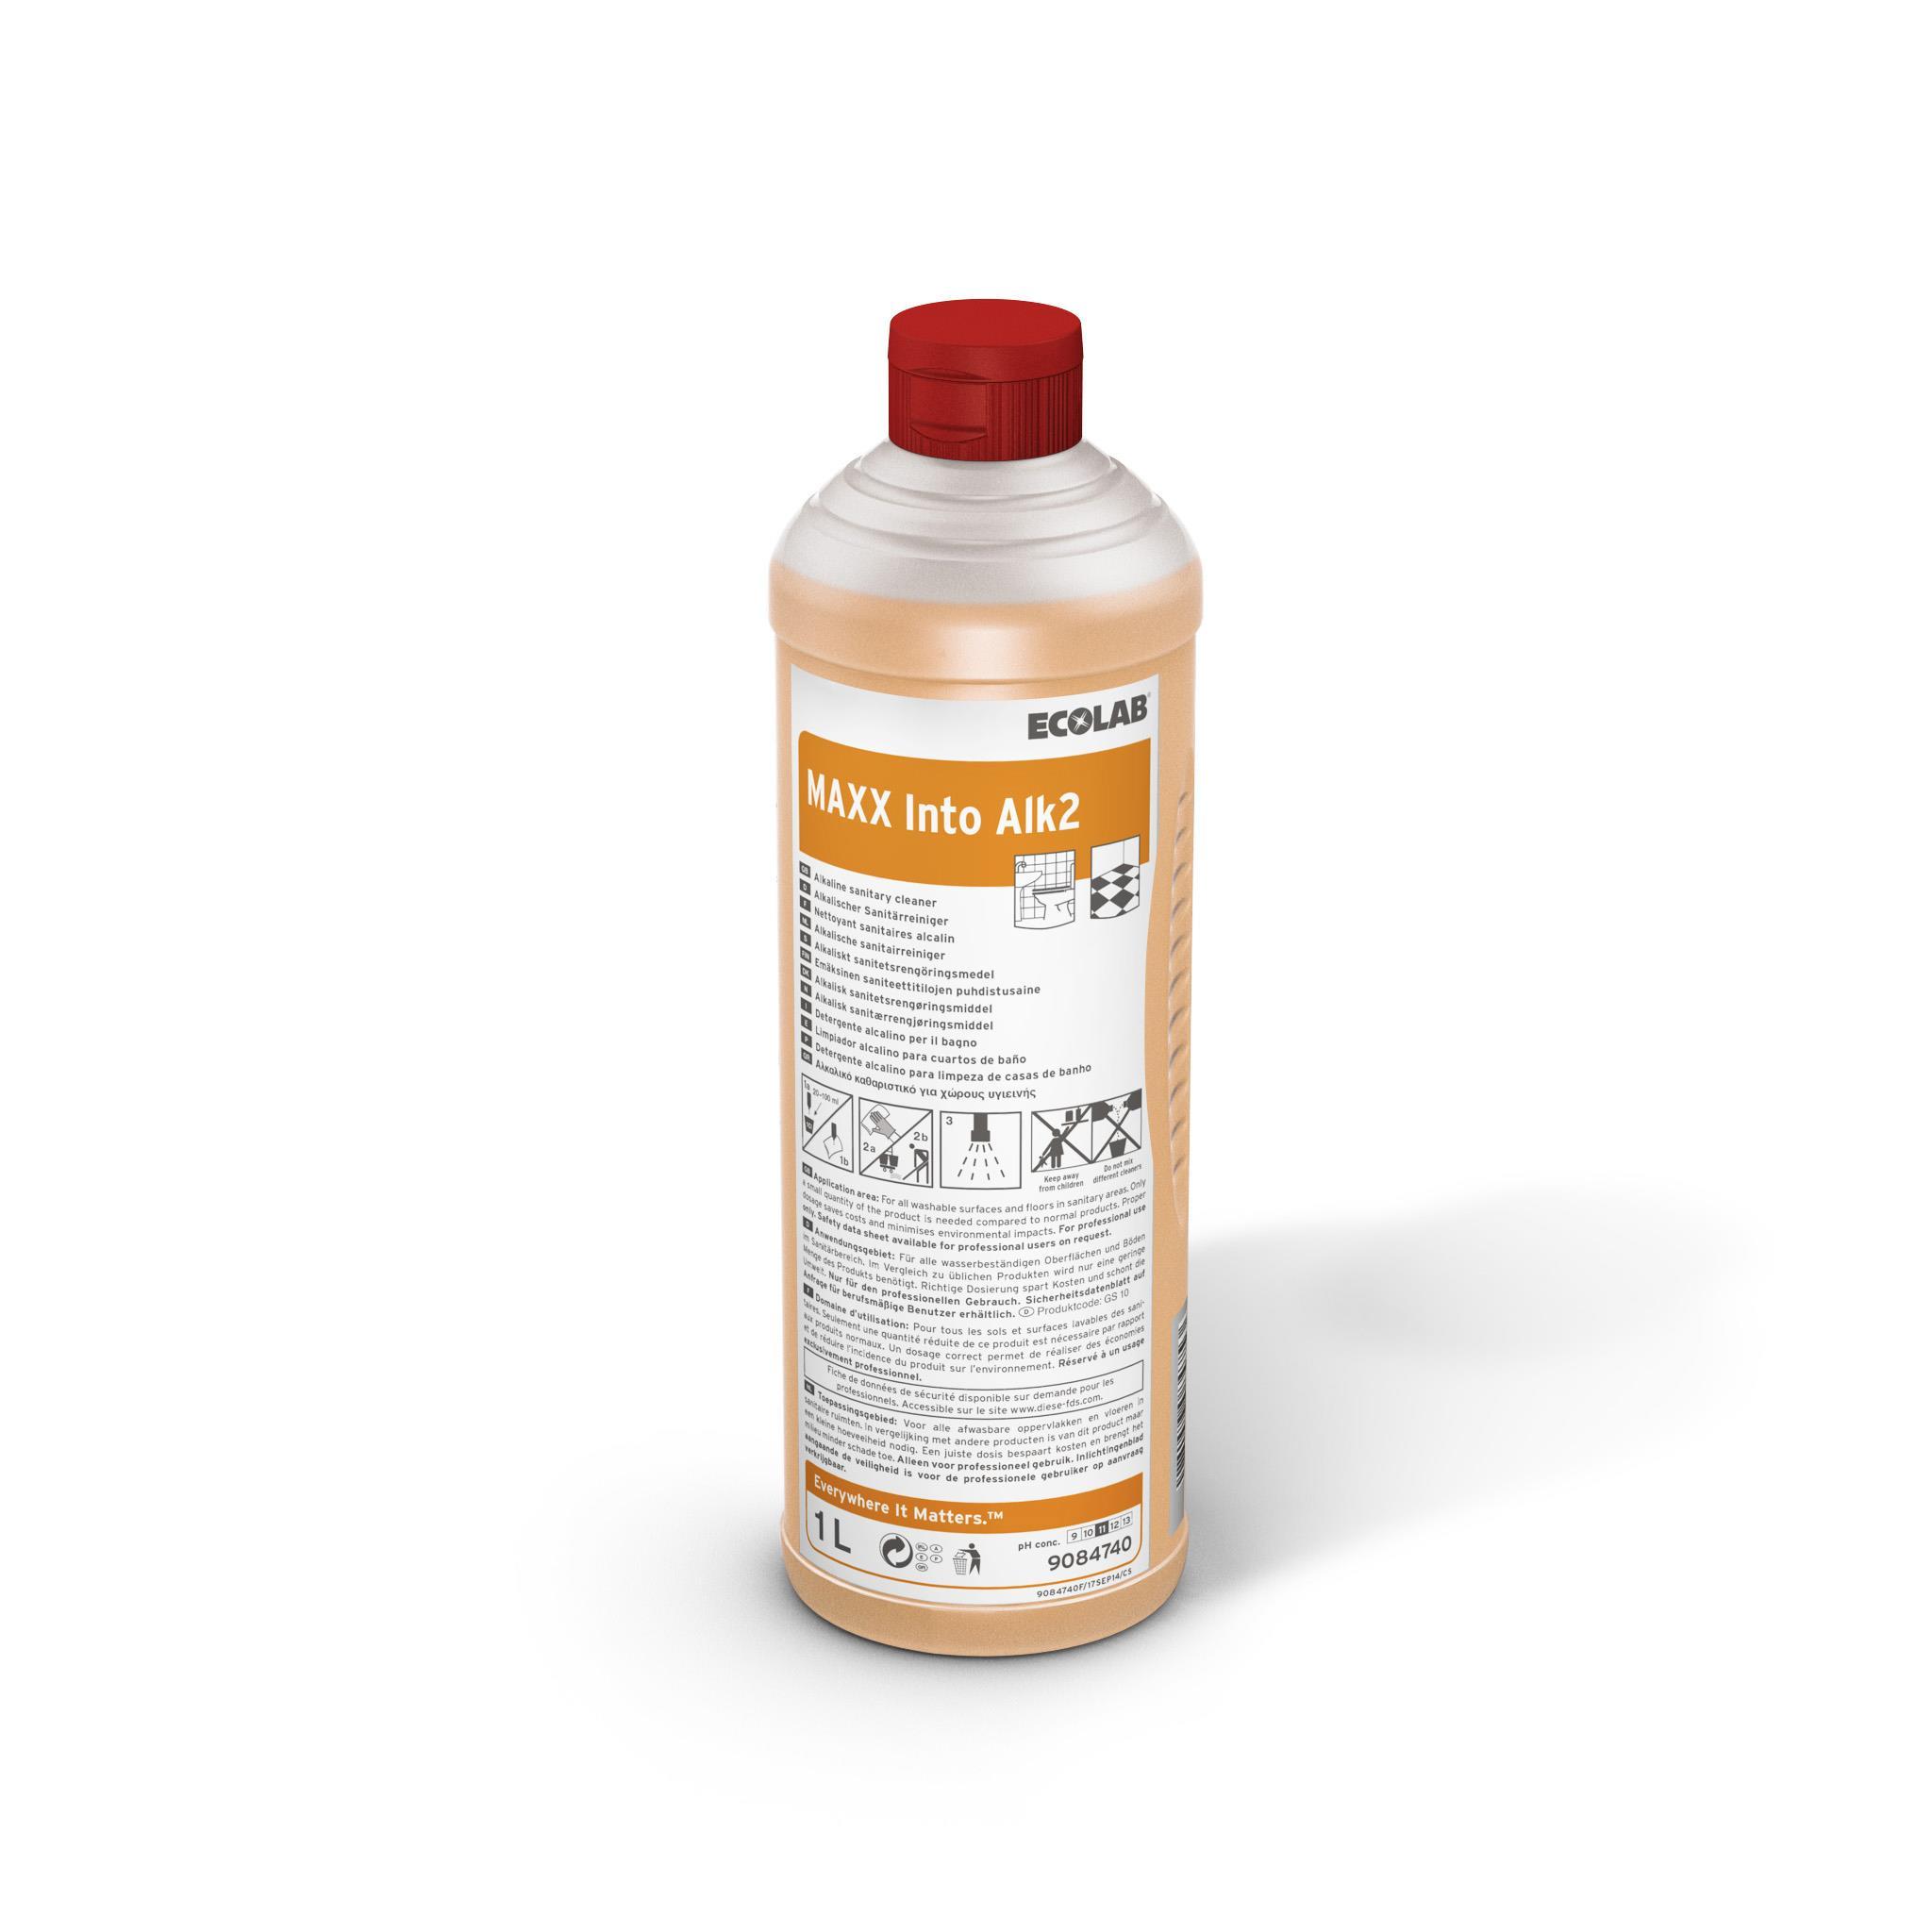 Detergent Sanitar Alcalin Maxx2 Into Alk 1l Ecolab 2021 sanito.ro